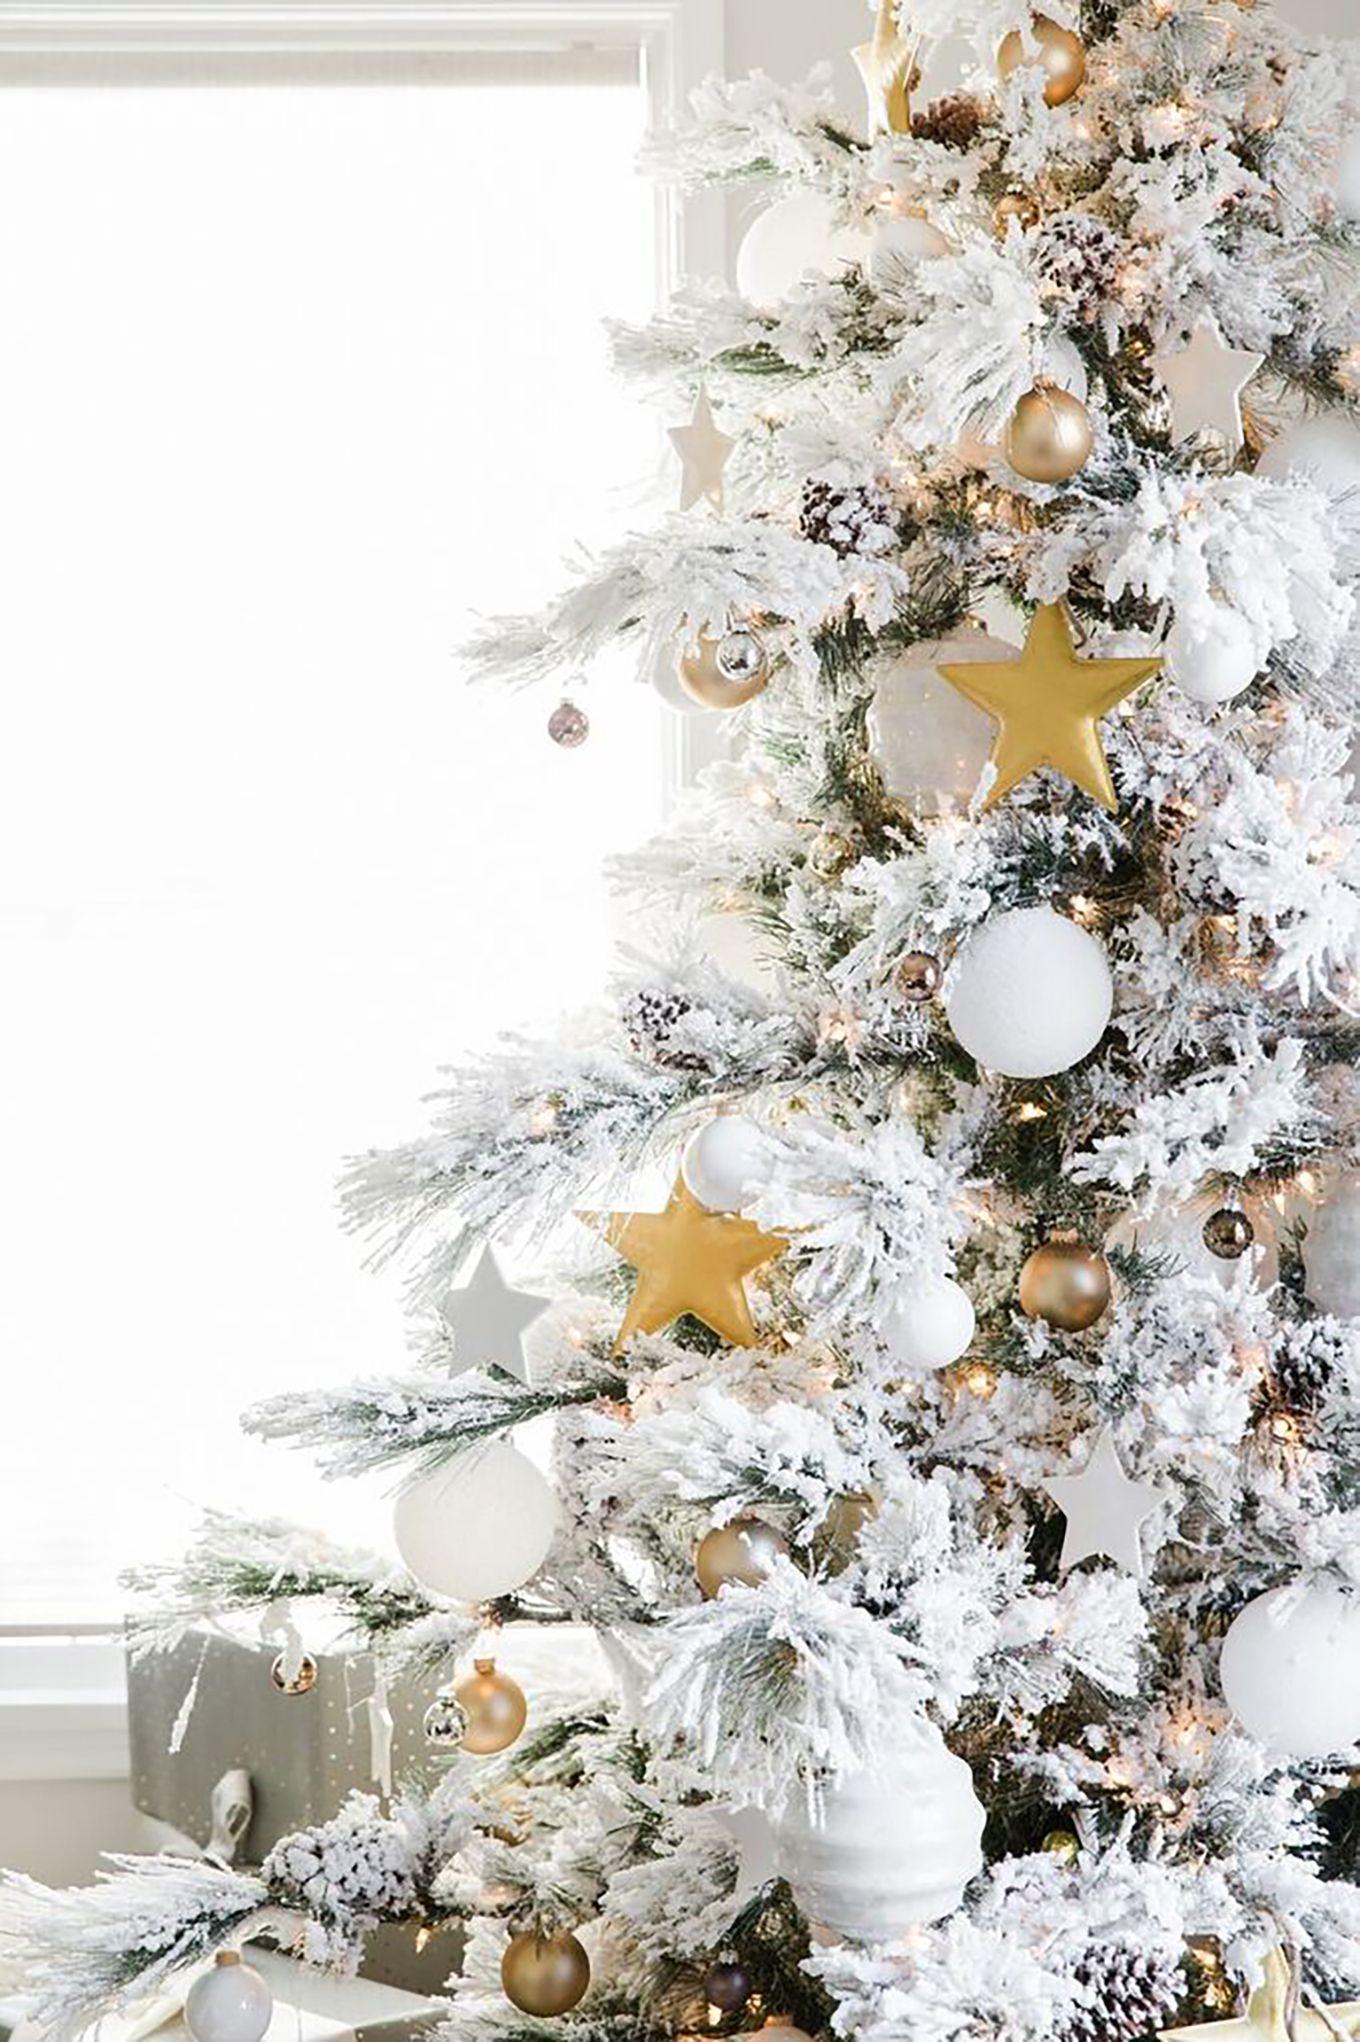 Home For Christmas Hello Fashion White Christmas Quotes Christmas Tree Themes White Christmas Snow